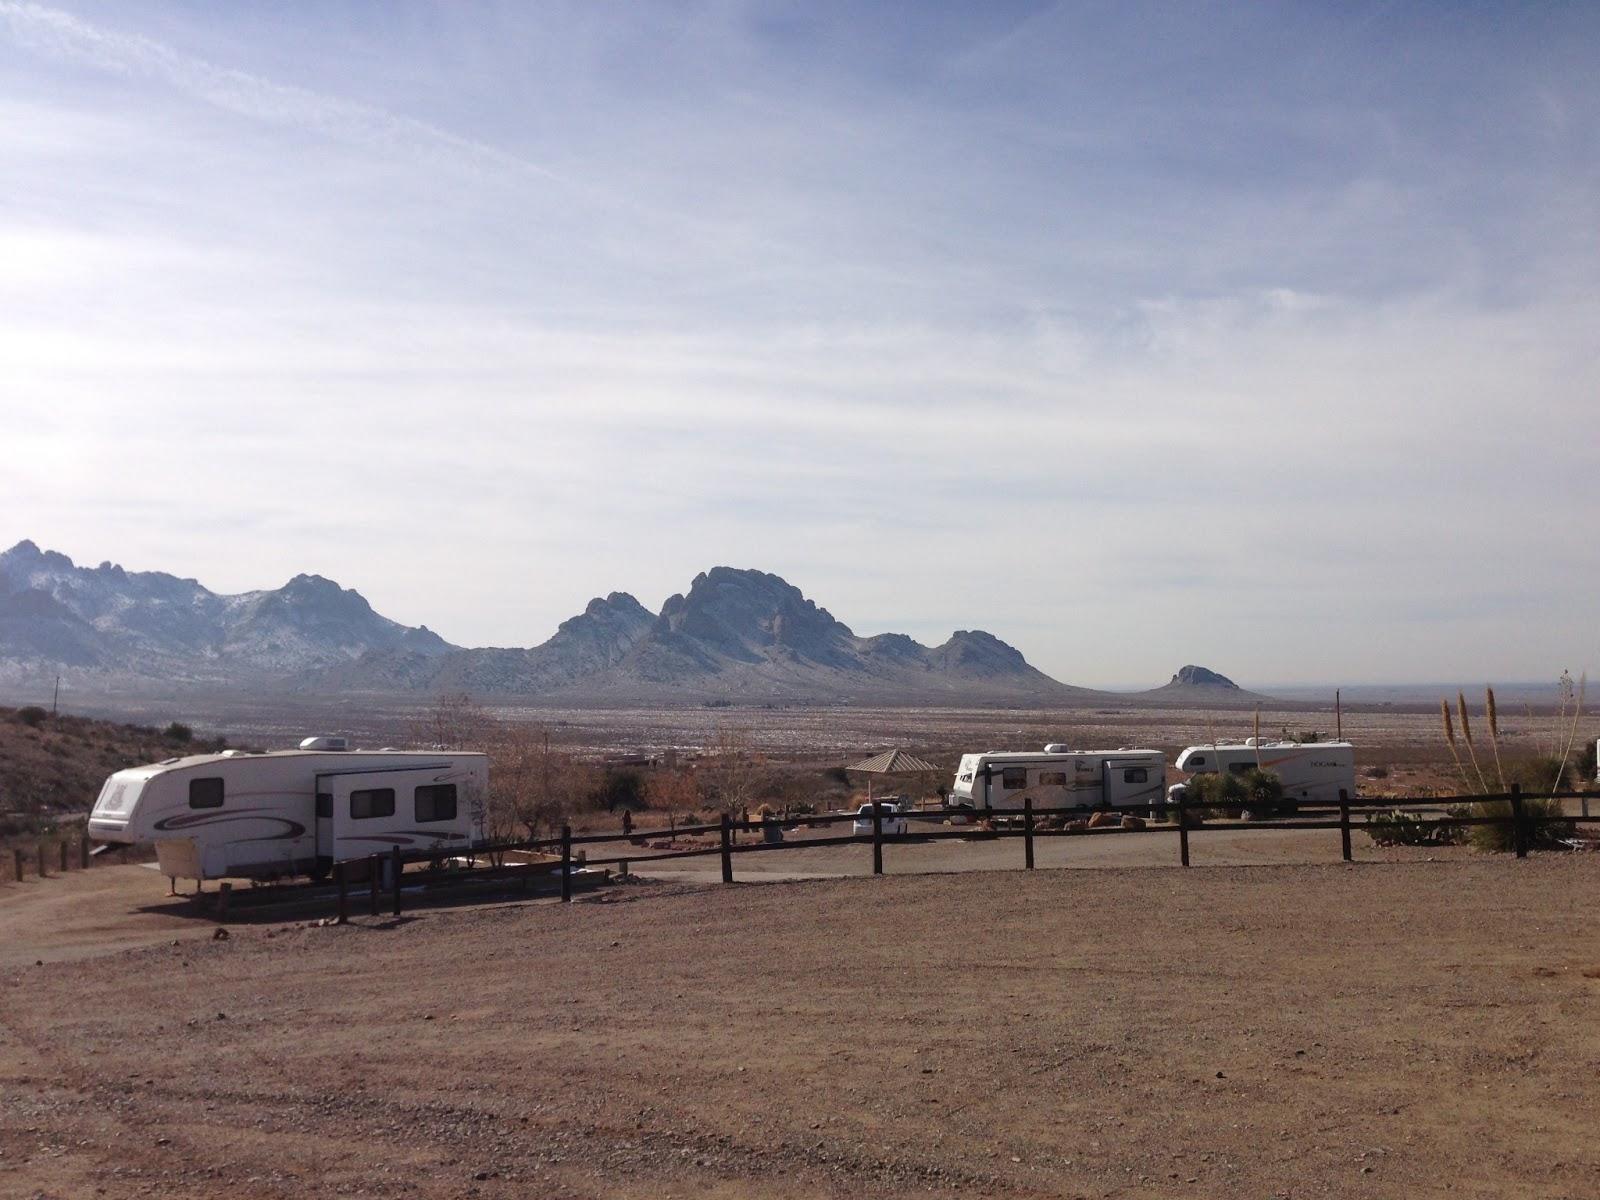 Marpeg: Deming, NM